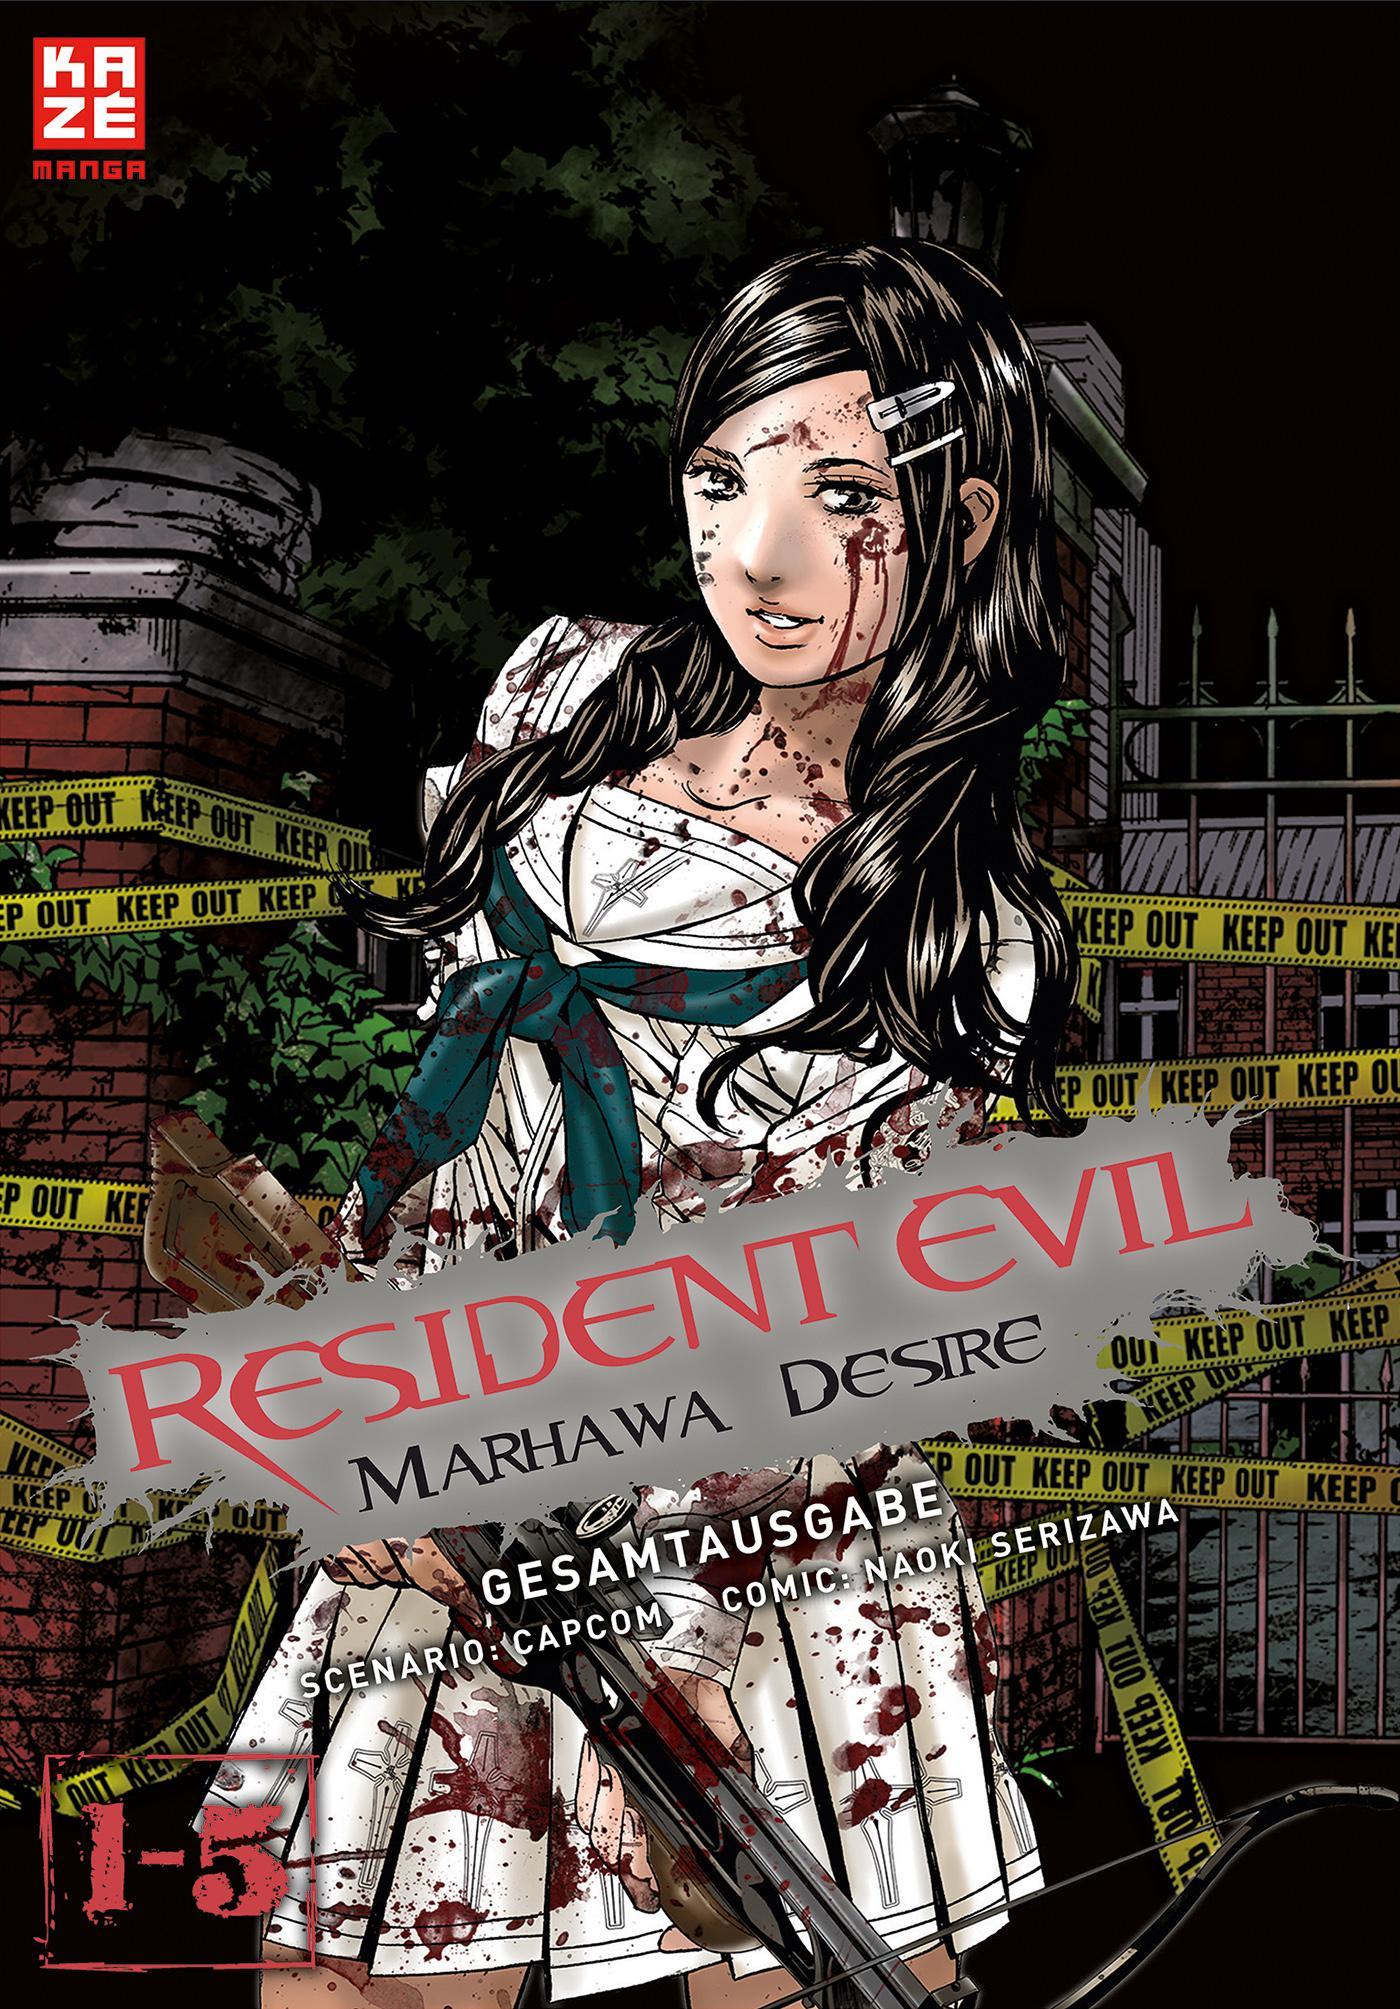 Resident Evil - Marhawa Desire Gesamtausgabe Naoki Serizawa